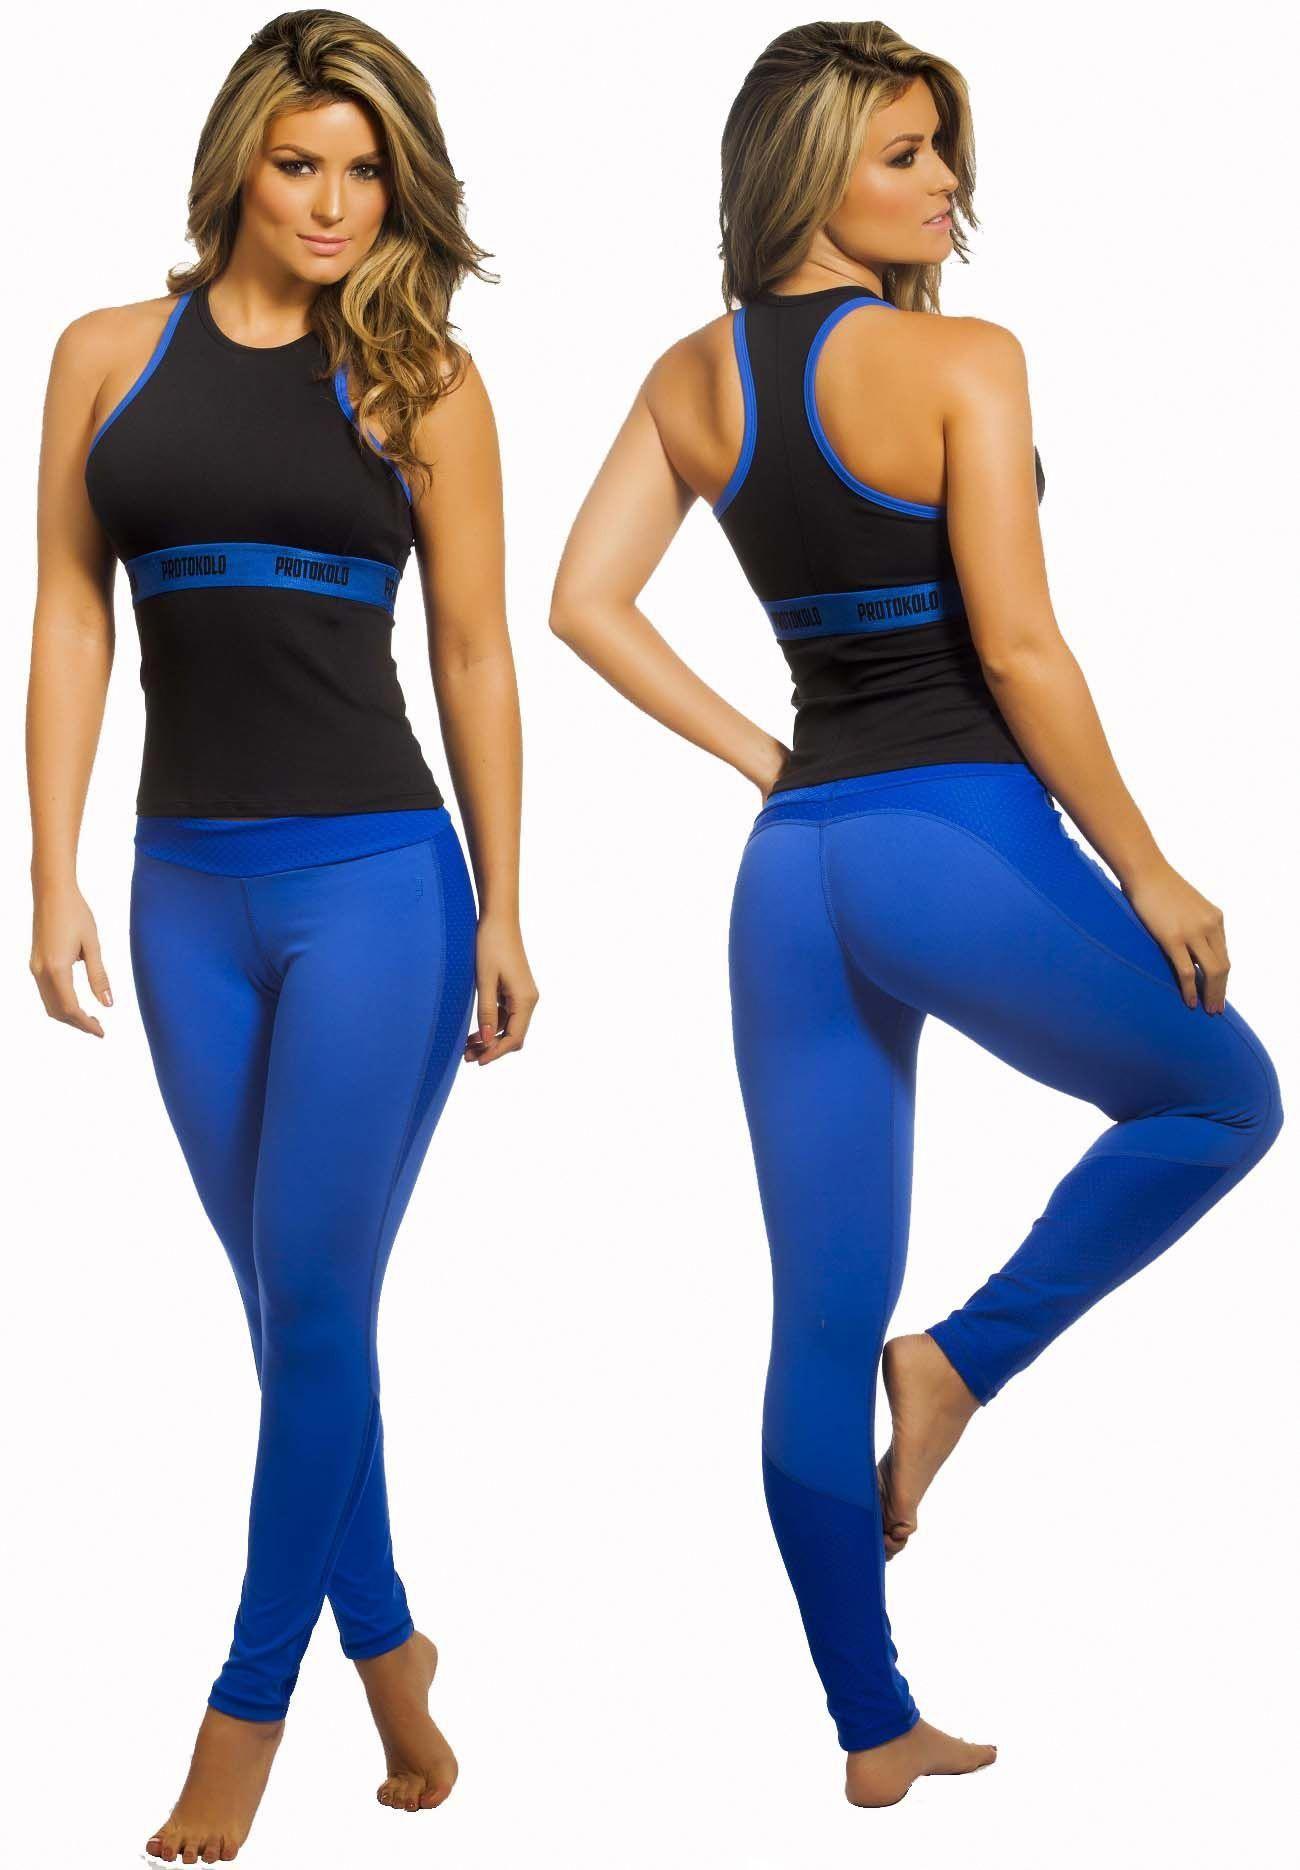 e3b44fc3549 Protokolo 064 Women Casual Wear Sports Clothing Activewear Workout ...